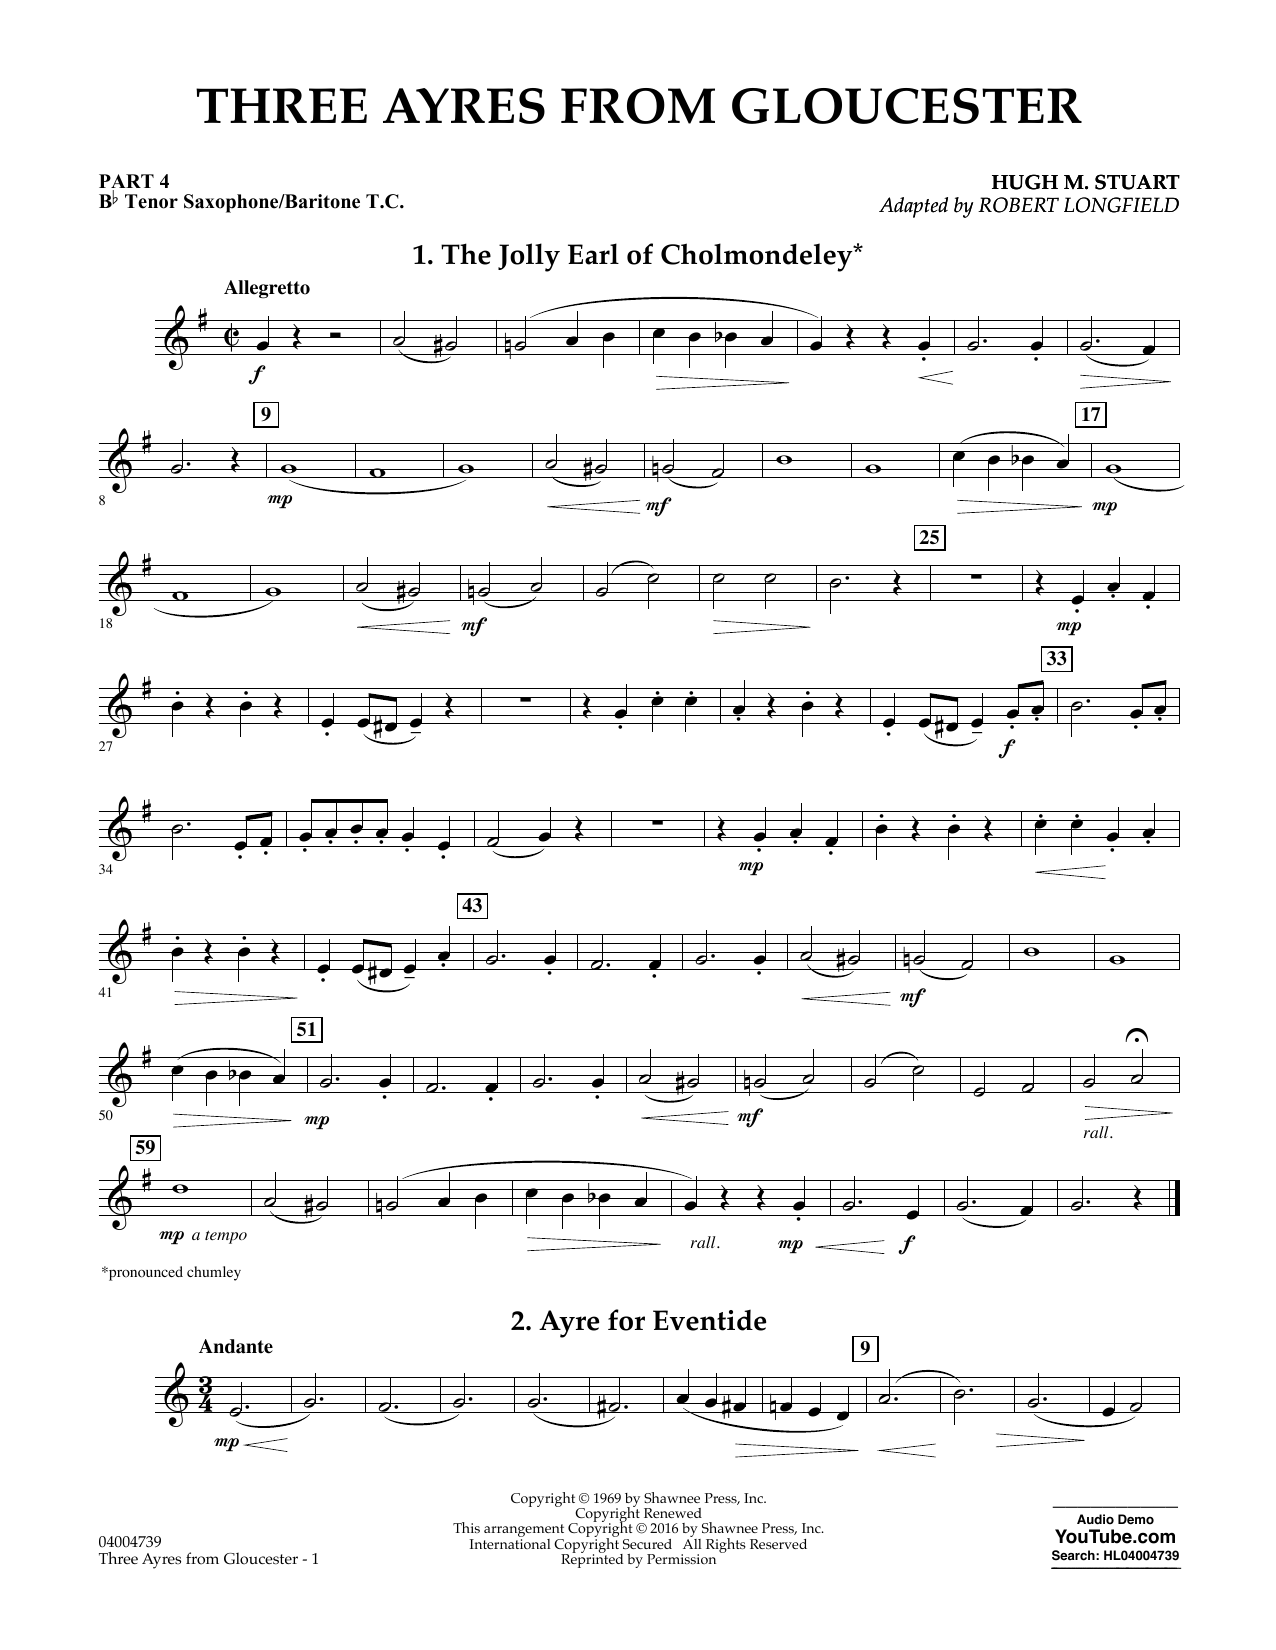 Three Ayres from Gloucester - Pt.4 - Bb Tenor Sax/Bar. T.C. (Flex-Band)